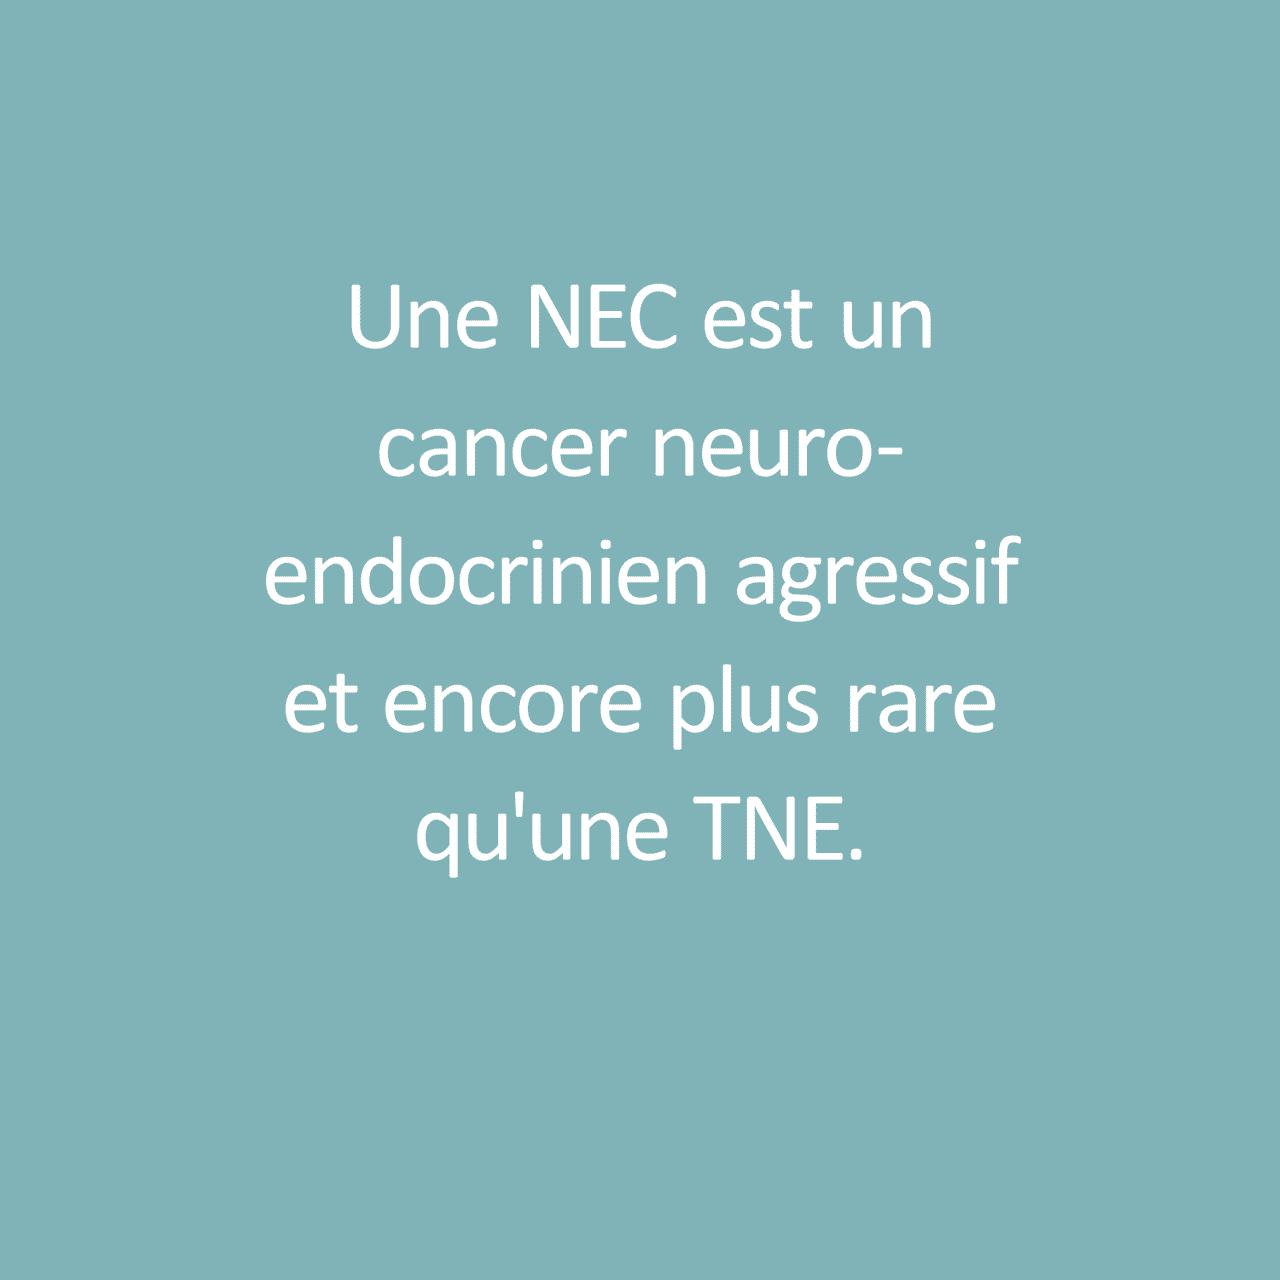 "Fact about Neuroendocrine Carcinoma / Fait sur Neuroendocrine Carcinome: ""Une NEC est un cancer neuroendocrinien agressif et encore plus rare qu'une TNE"""